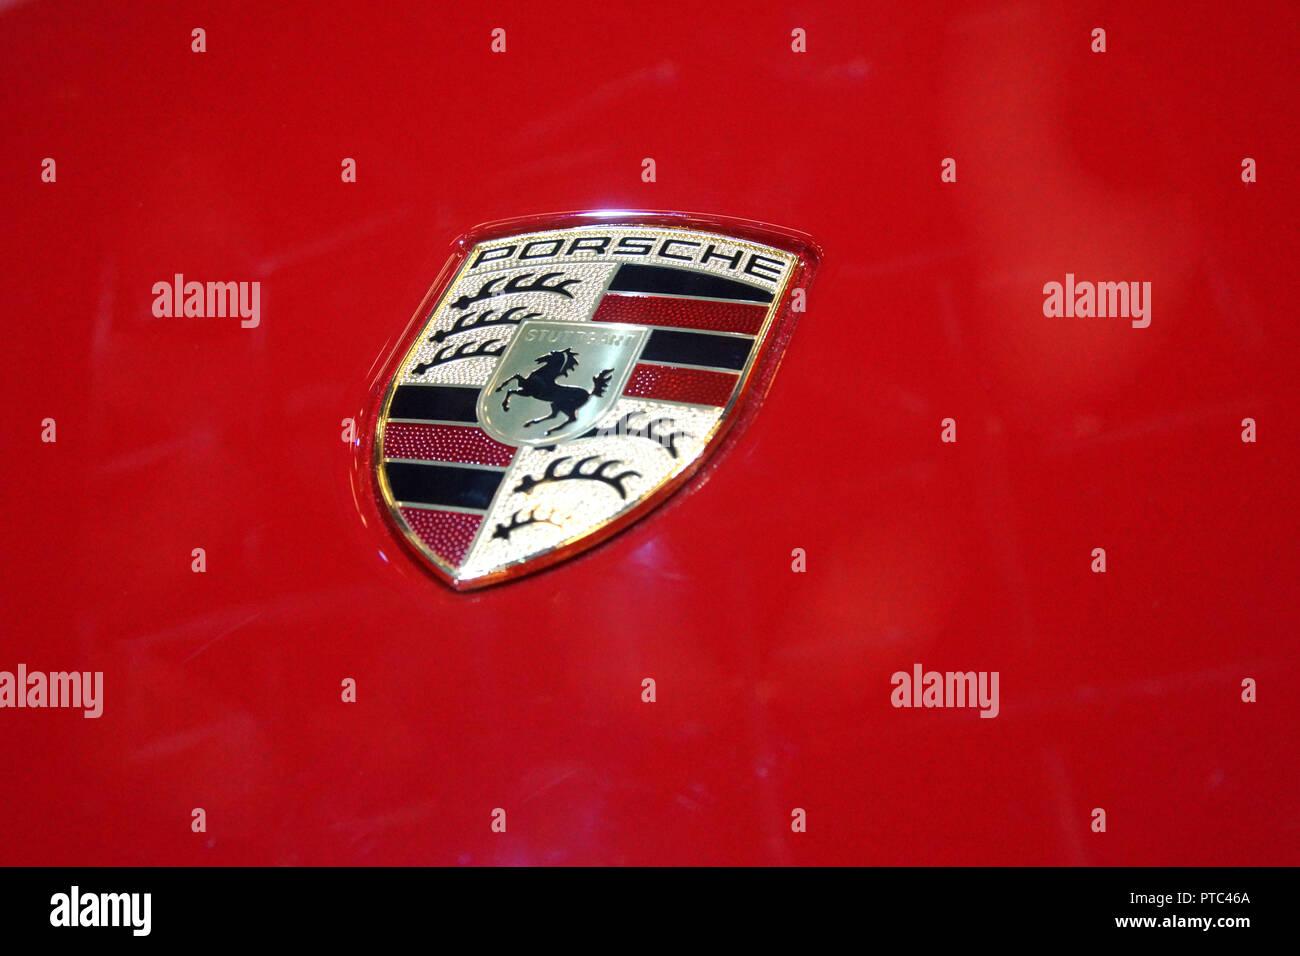 Porsche Logo Emblem Stock Photos Porsche Logo Emblem Stock Images